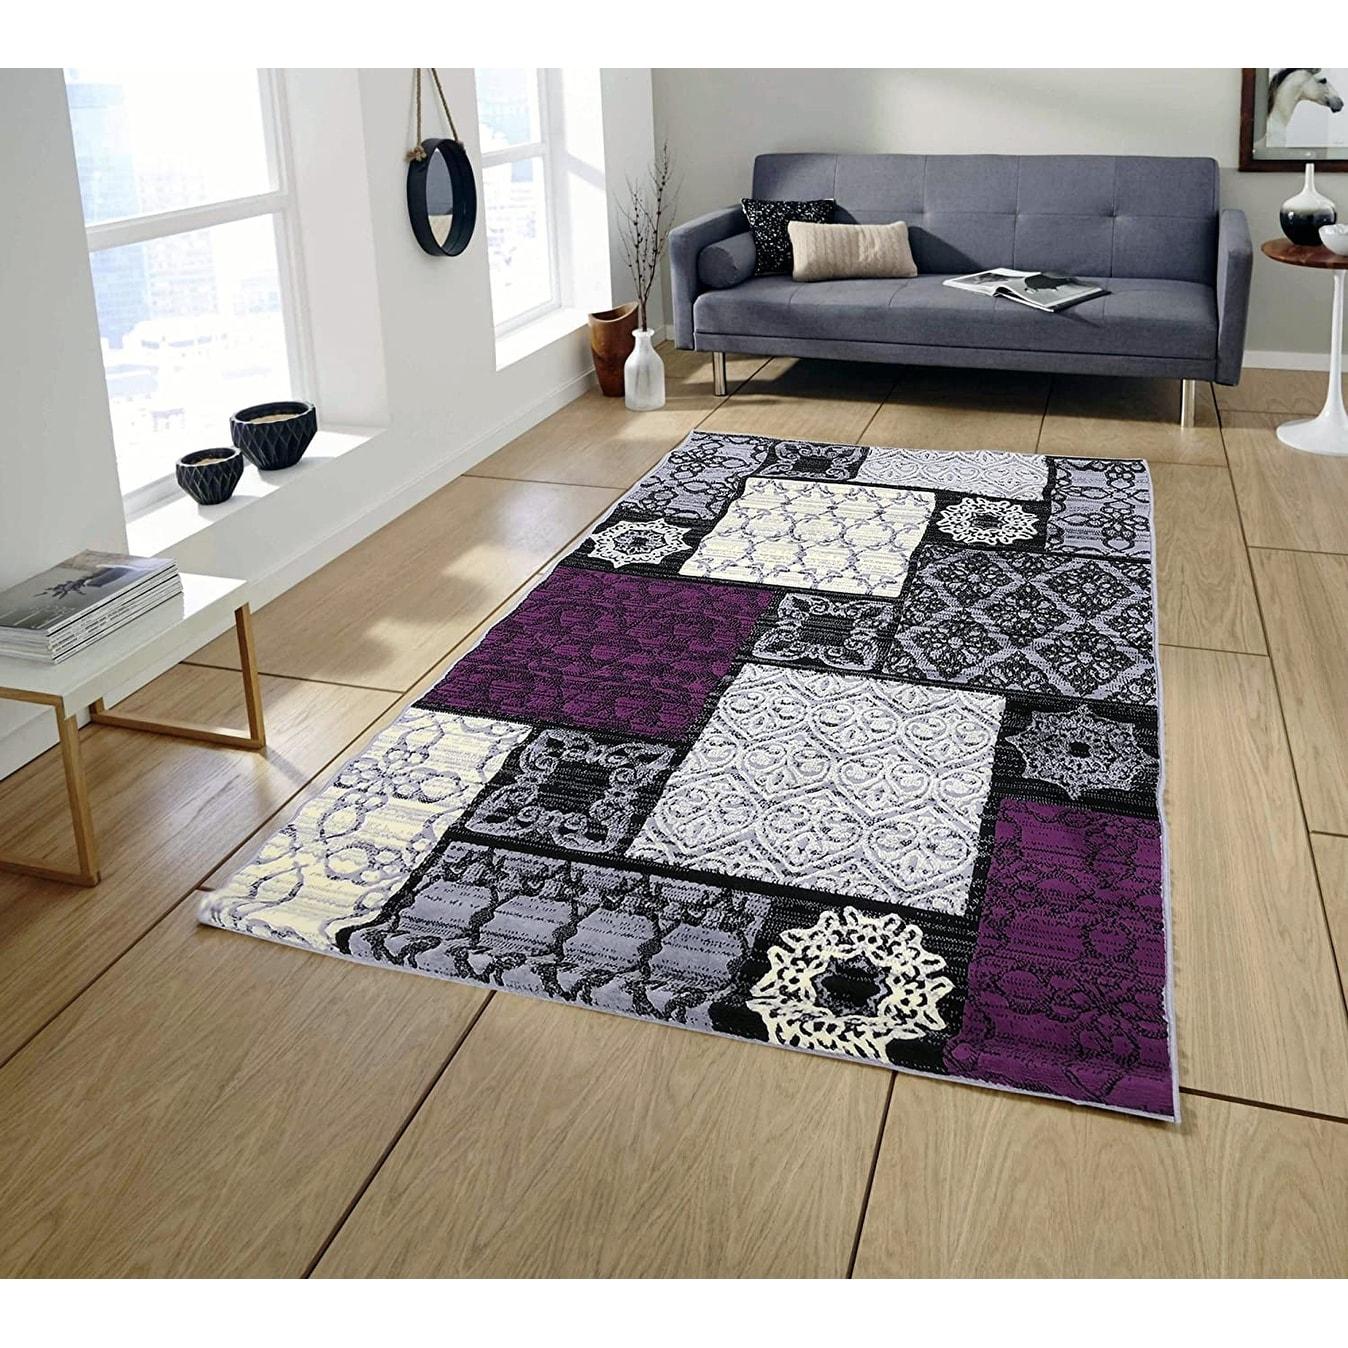 Pyramid Decor Area Rugs Grey Violet Modern Geometric Design 5 2 X 7 3 Overstock 24087055